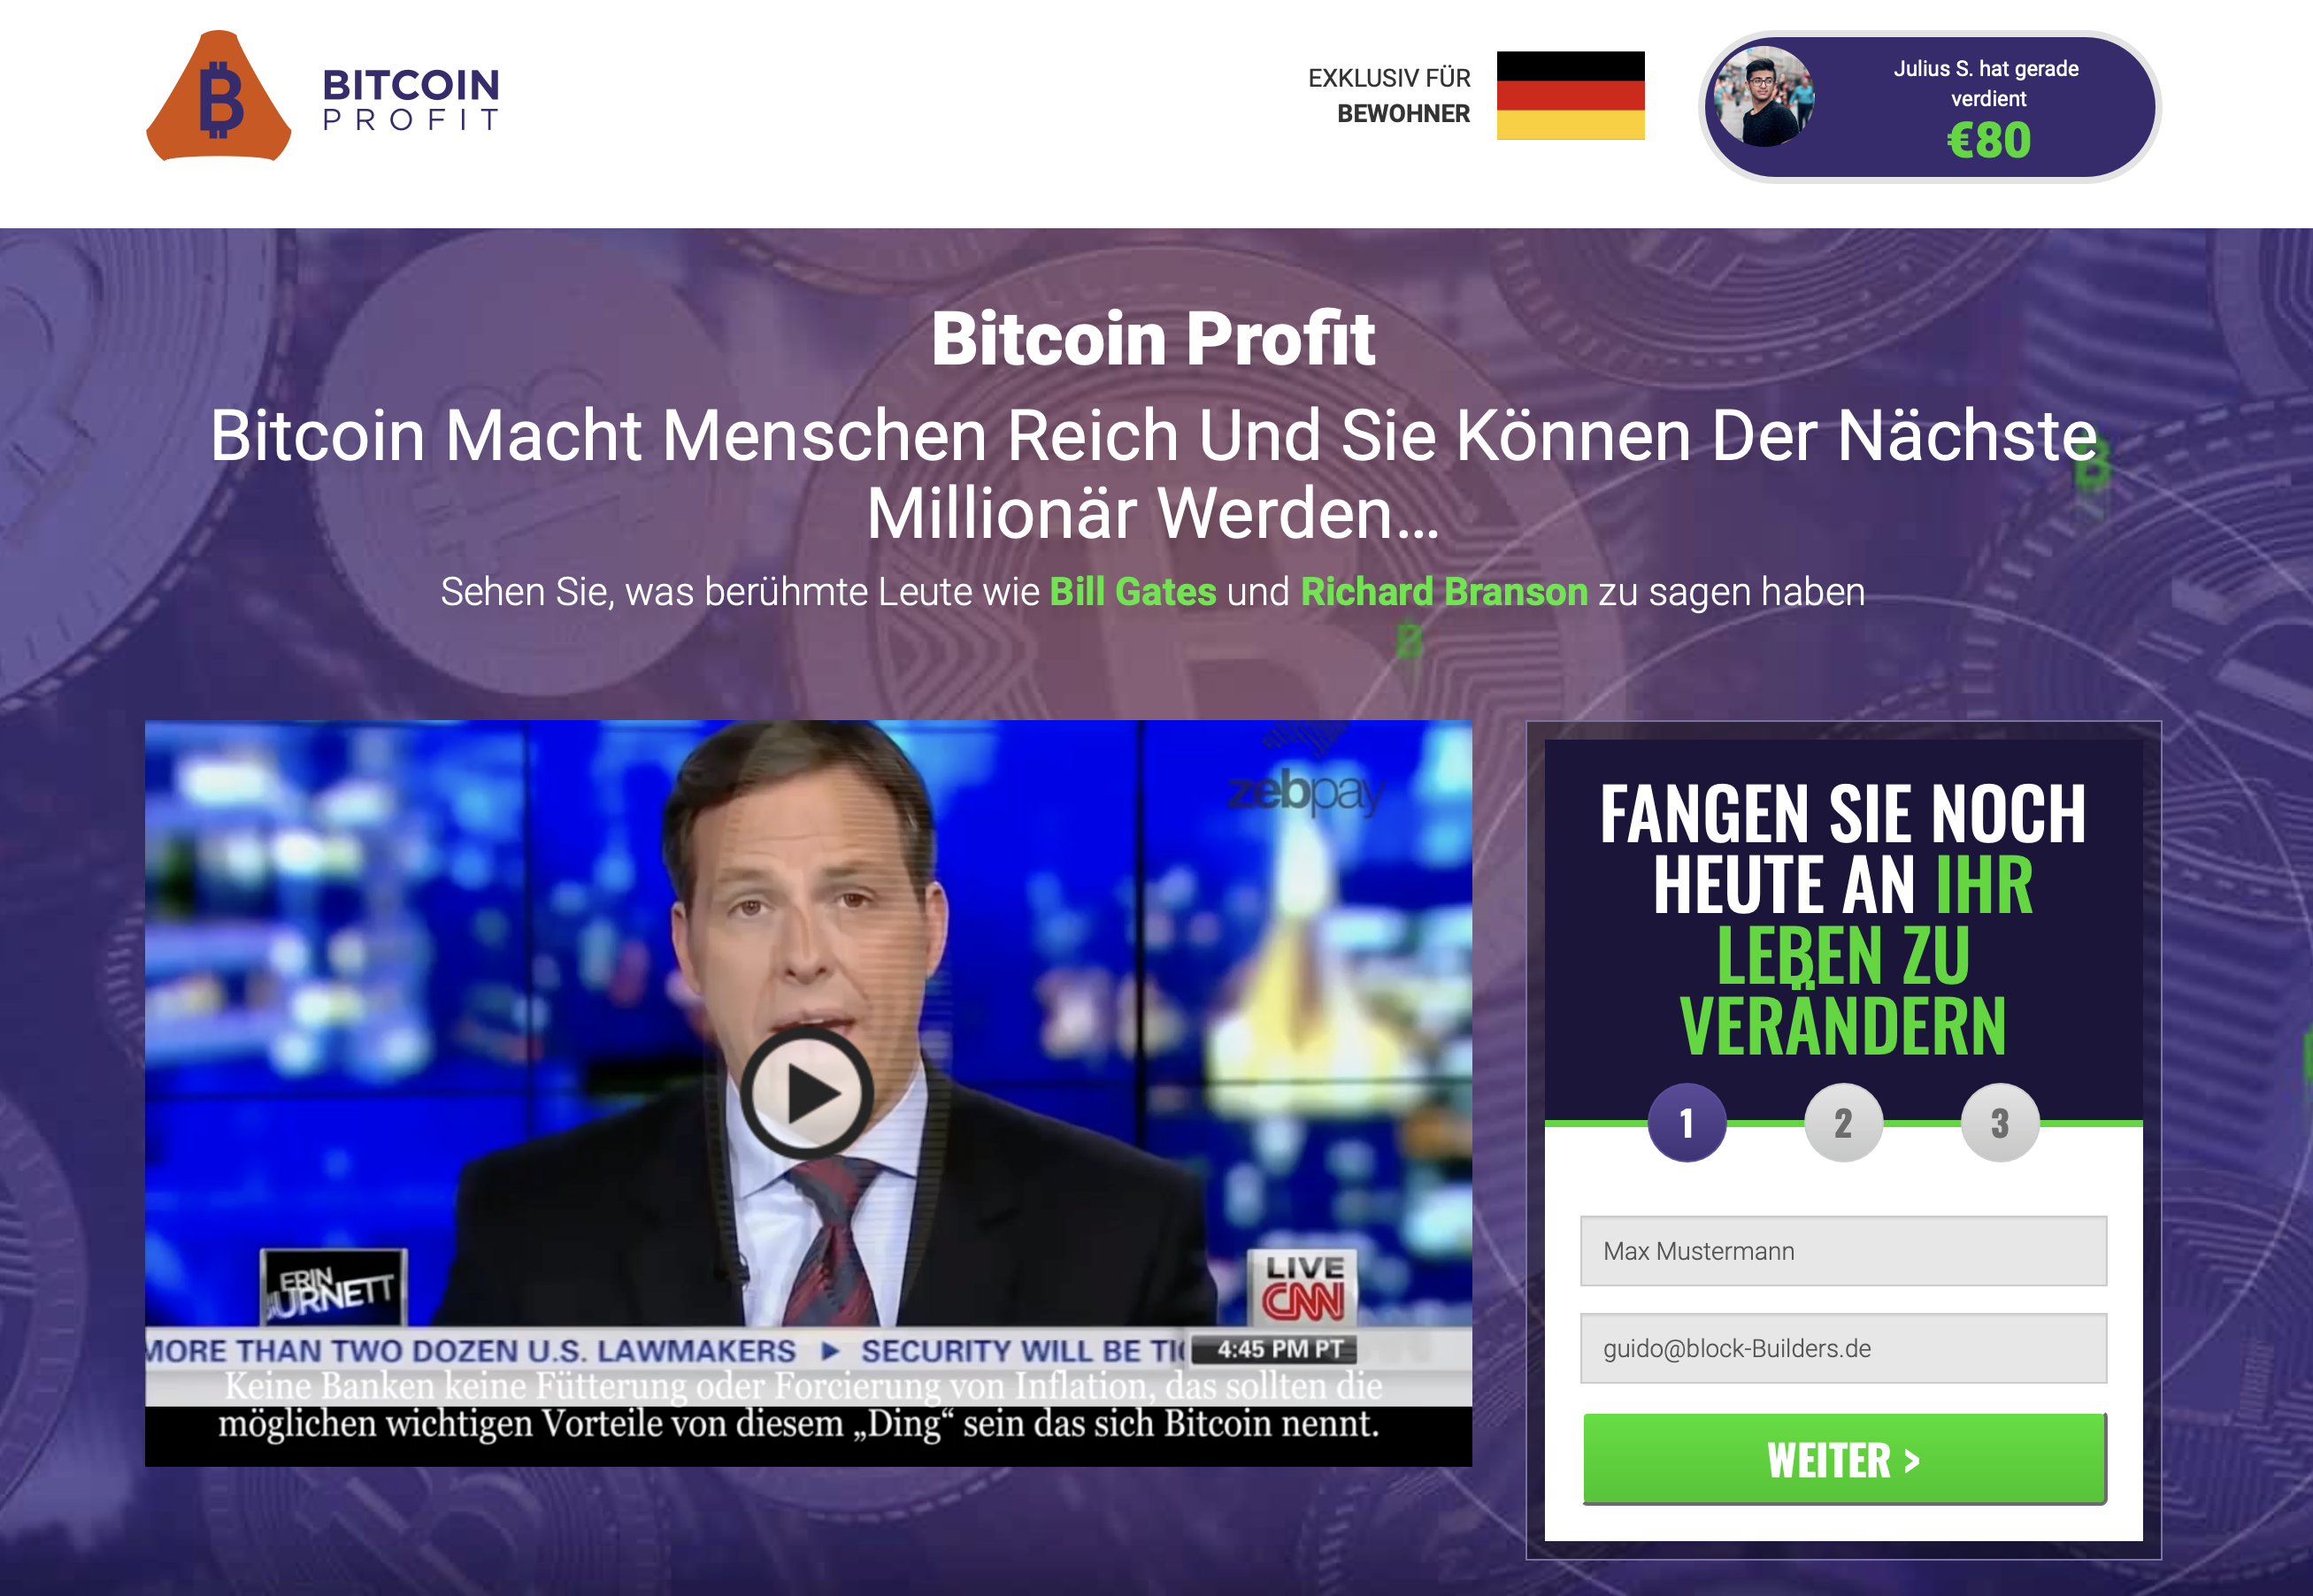 wie funktioniert bitcoin profit)